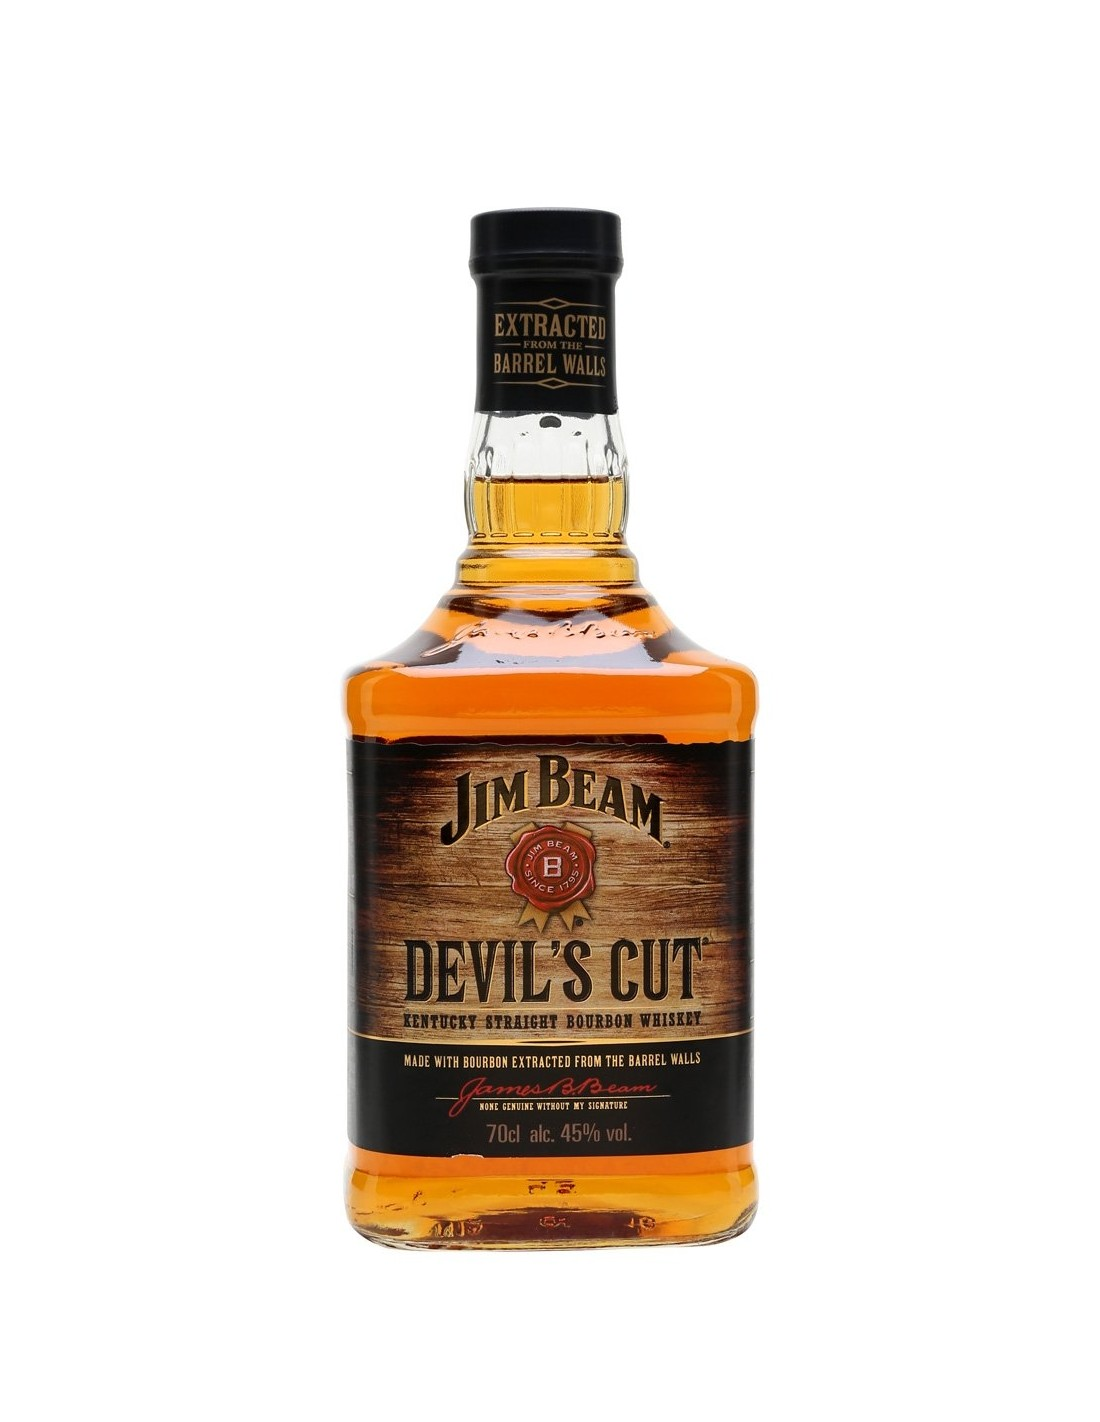 Whisky Bourbon Jim Beam Devil's Cut, 45% alc., 0.7L